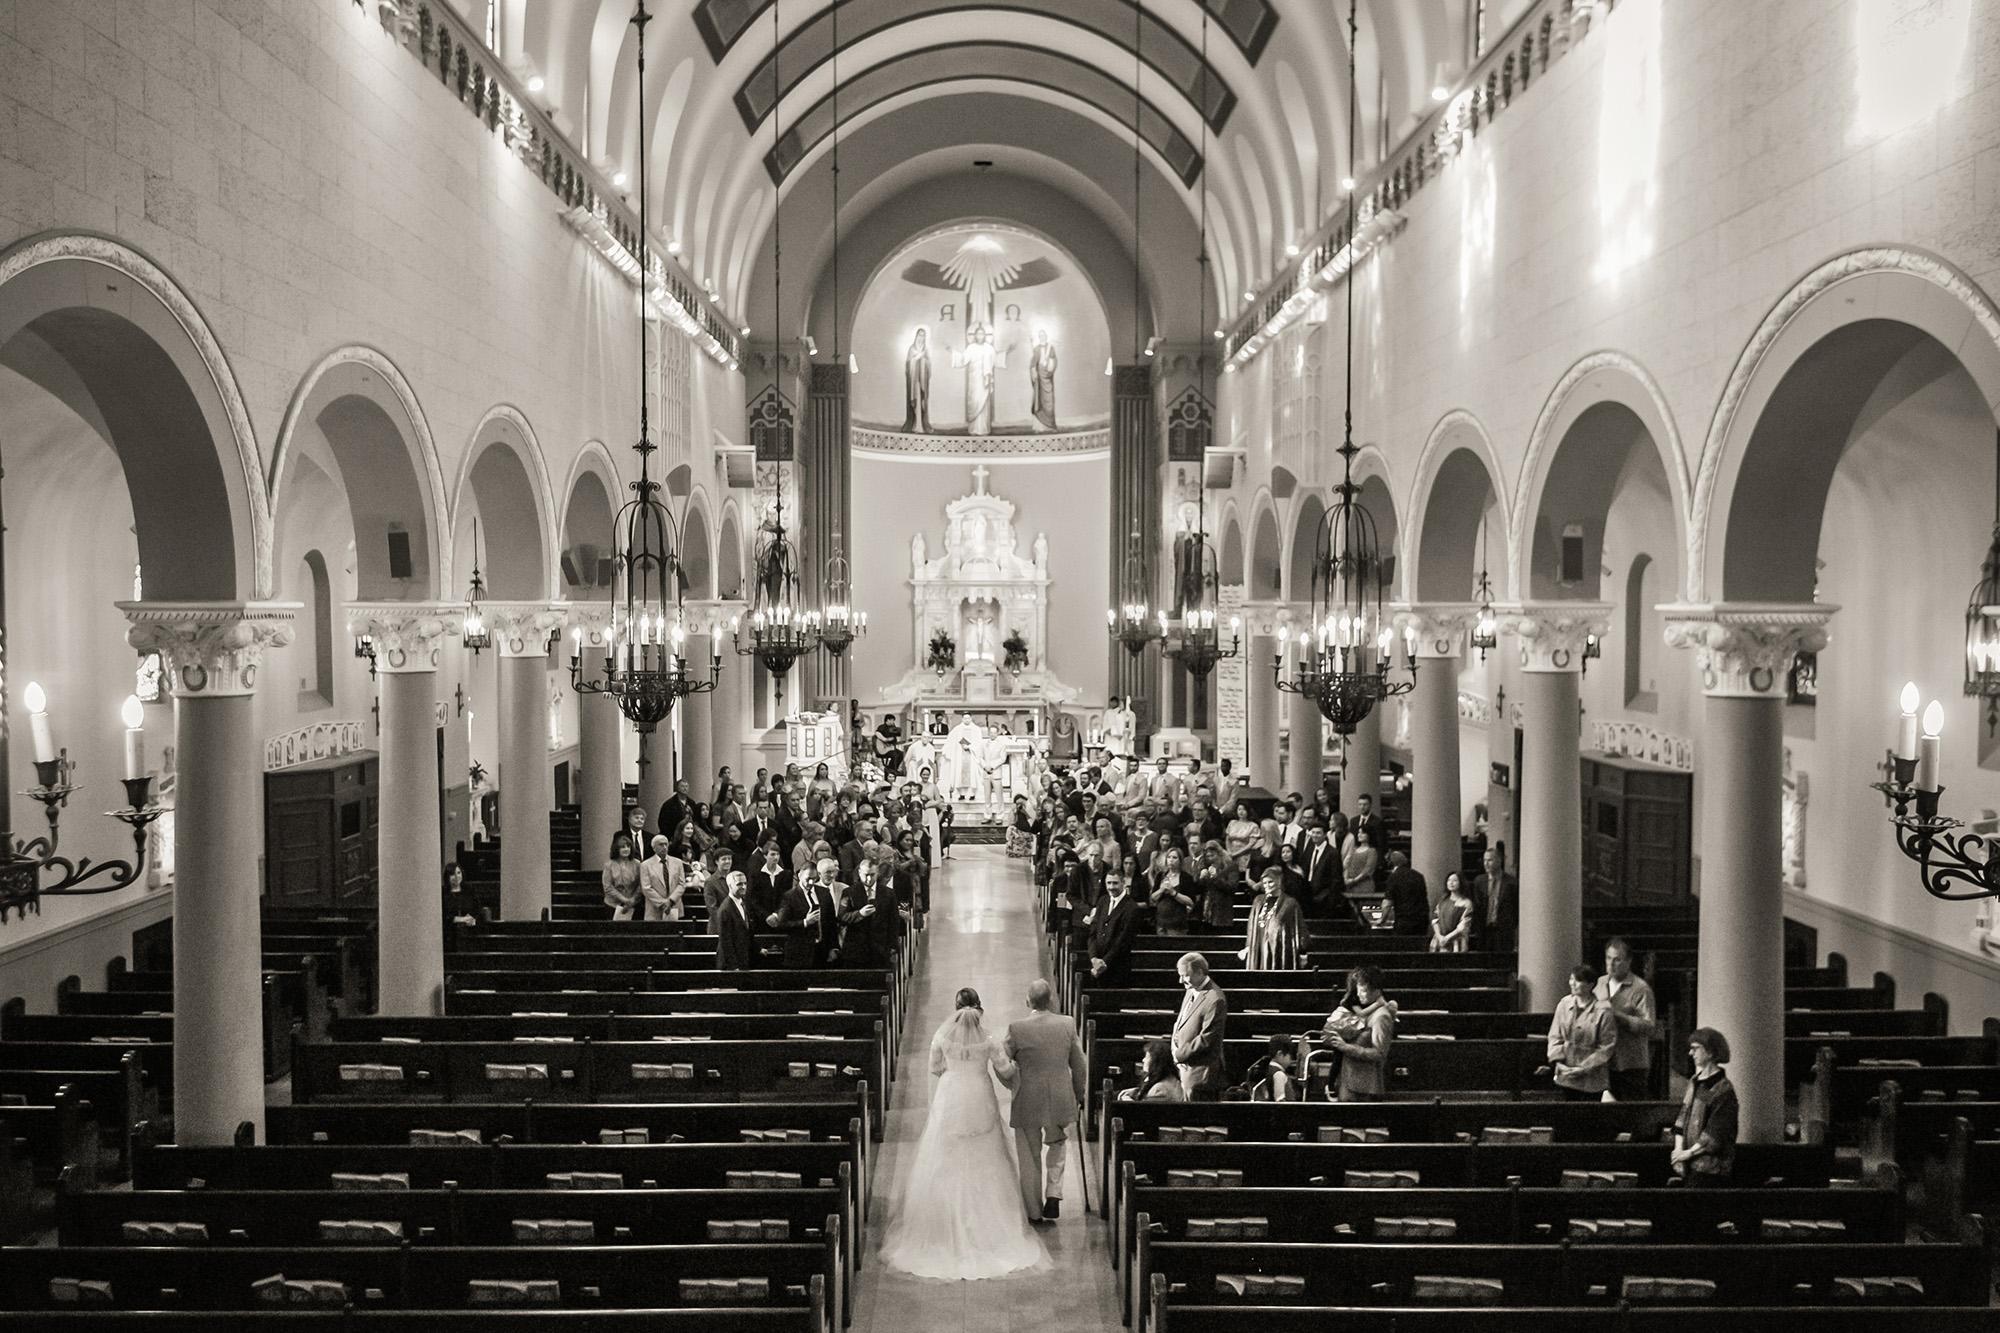 unforgettable-st-monica-wedding-carrie-vines-photography-057.jpg